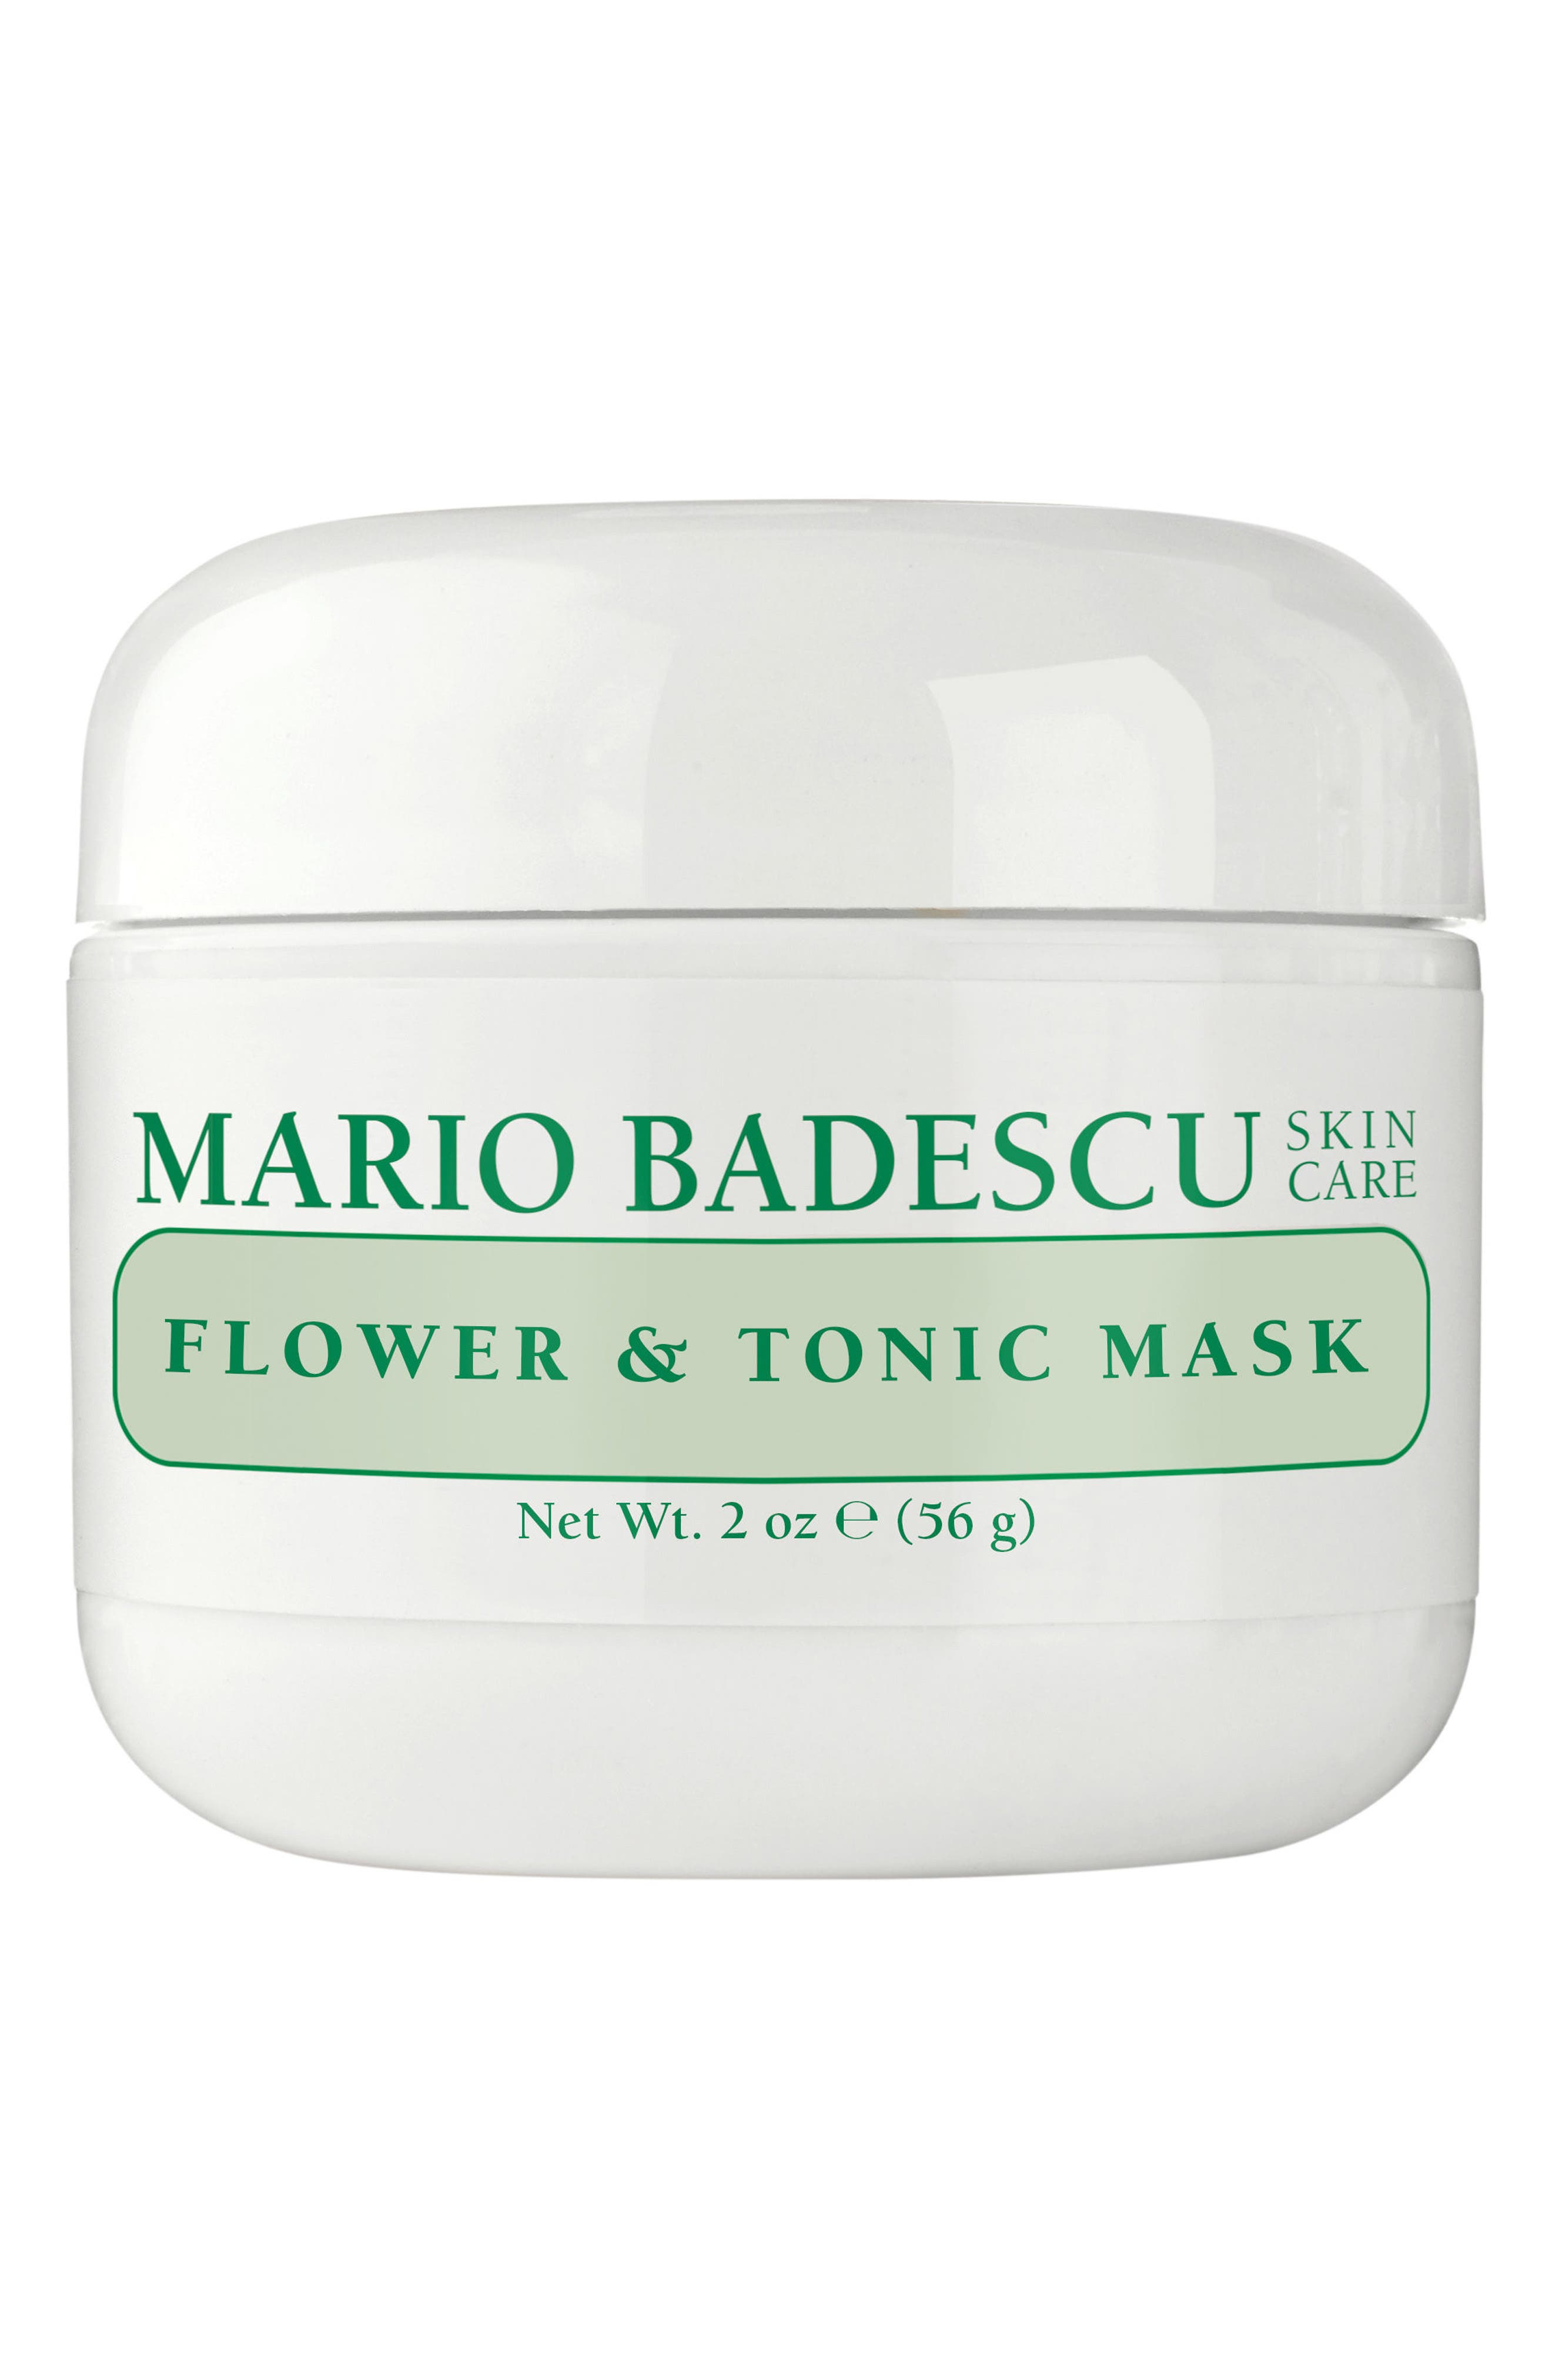 Flower & Tonic Mask,                             Alternate thumbnail 2, color,                             NONE